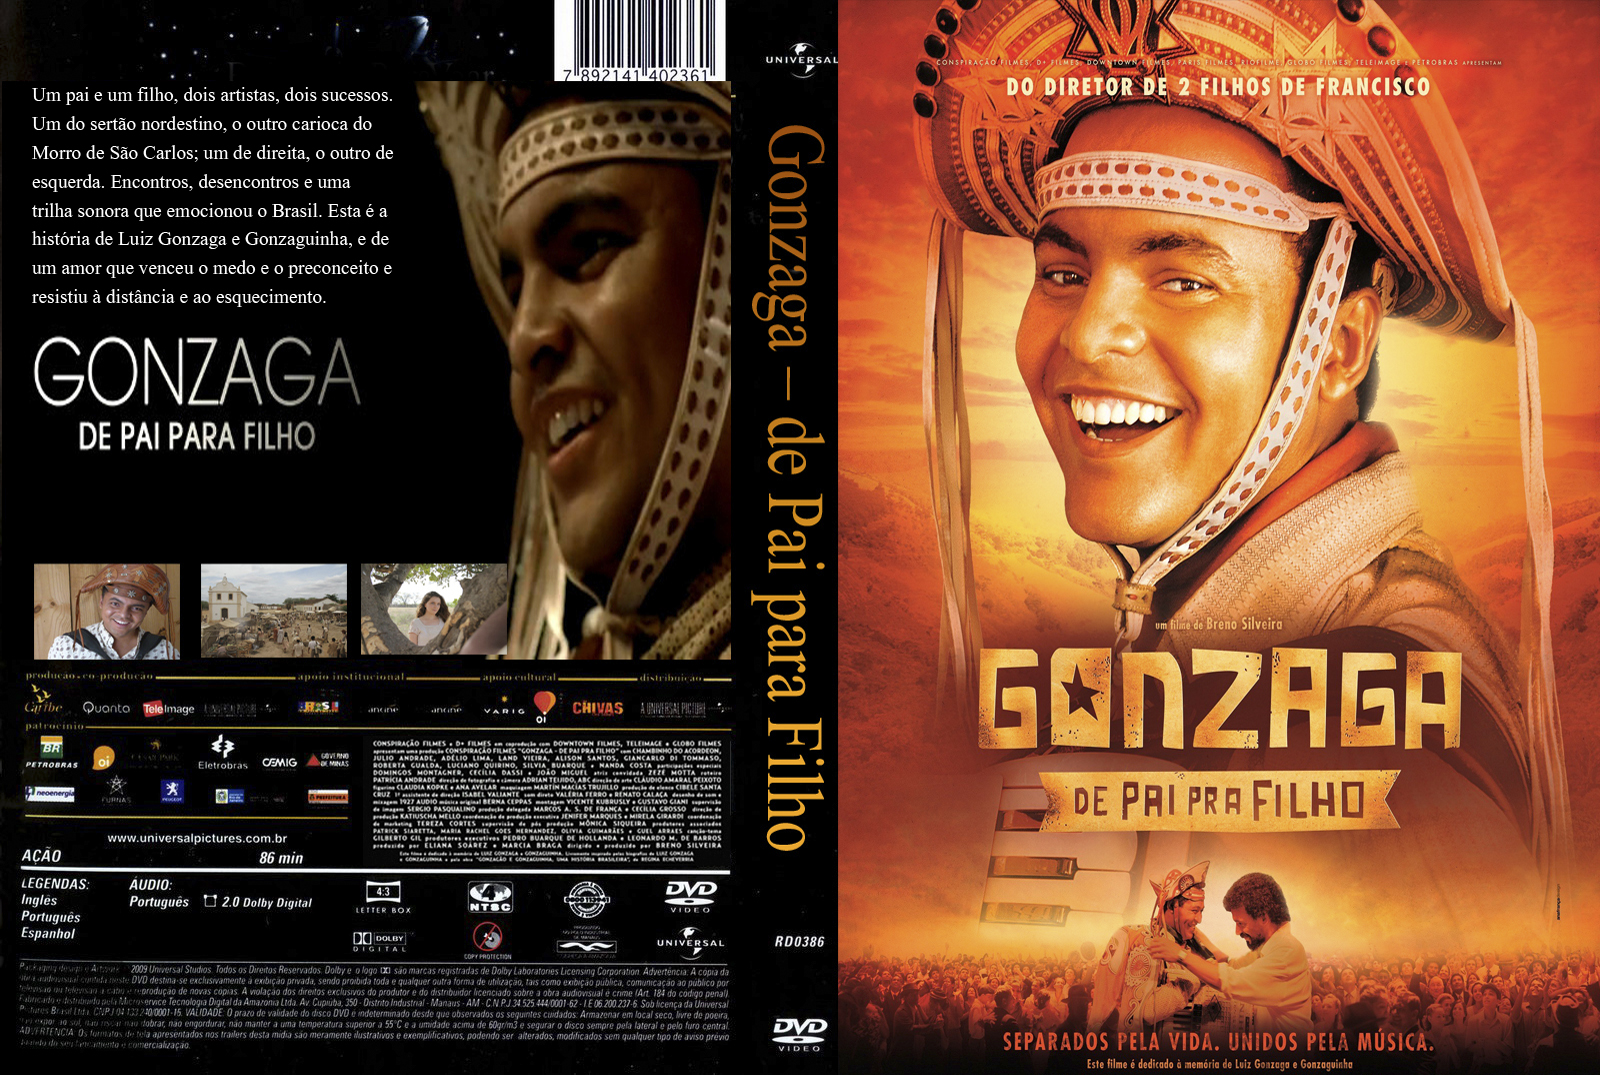 Gonzaga, de Pai para Filho